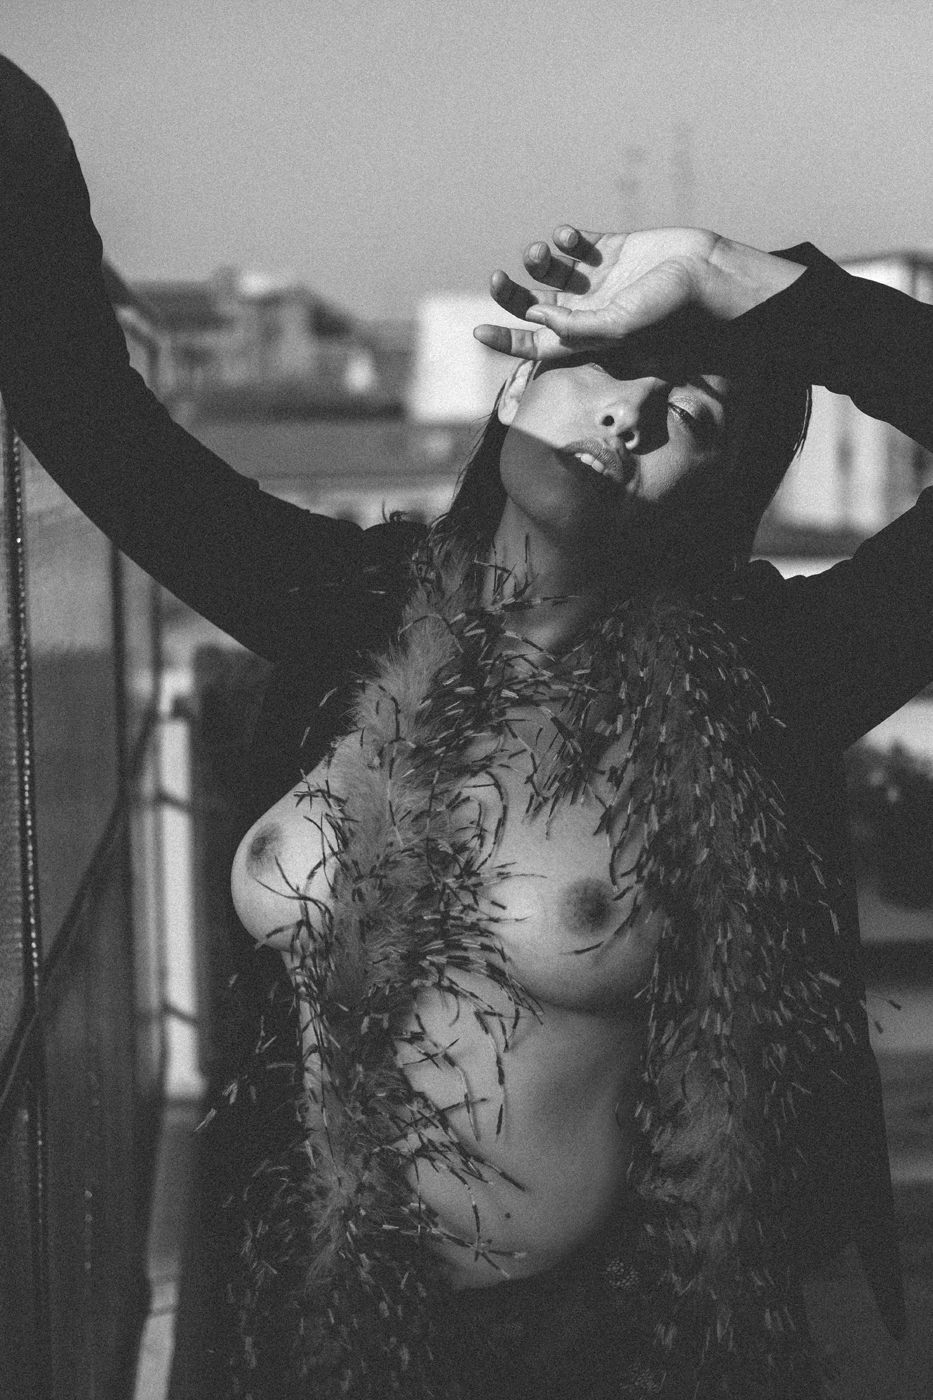 Micol Women  Micol Ronchi   // lionsmag.com - premium nude photography magazine